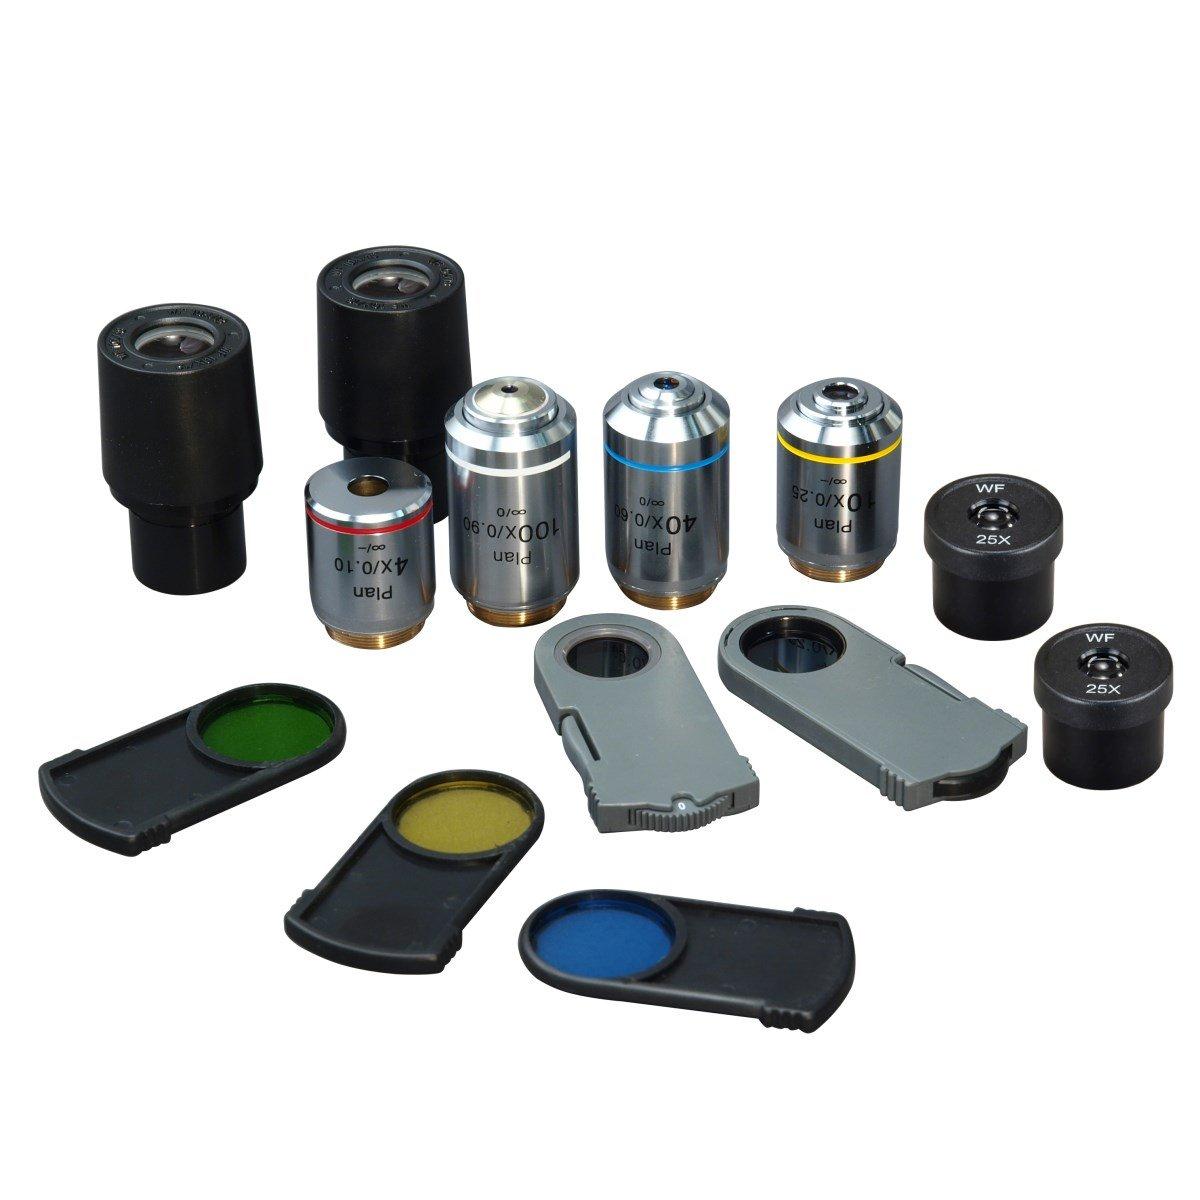 OMAX 40X-2500X Digital Infinity Trinocular Polarizing Metallurgical Microscope with 14MP Camera and 100X Dry Objective